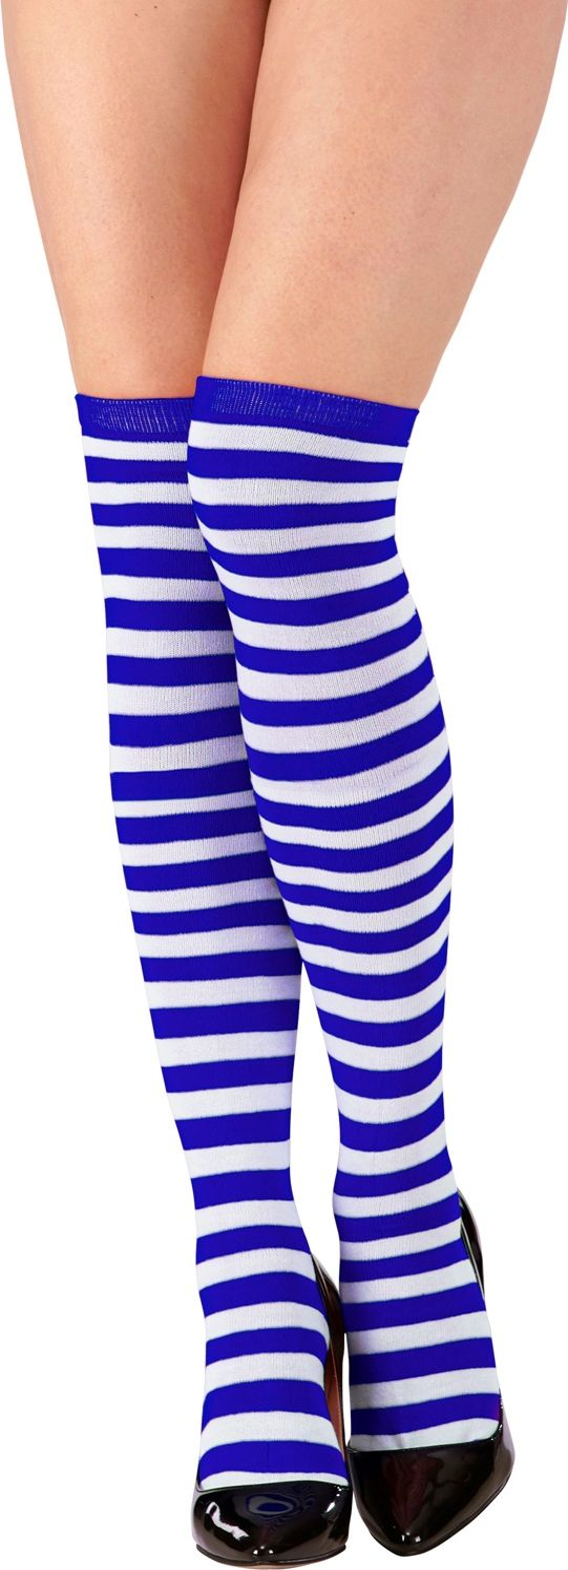 Pippi Langkous kniekous blauw wit